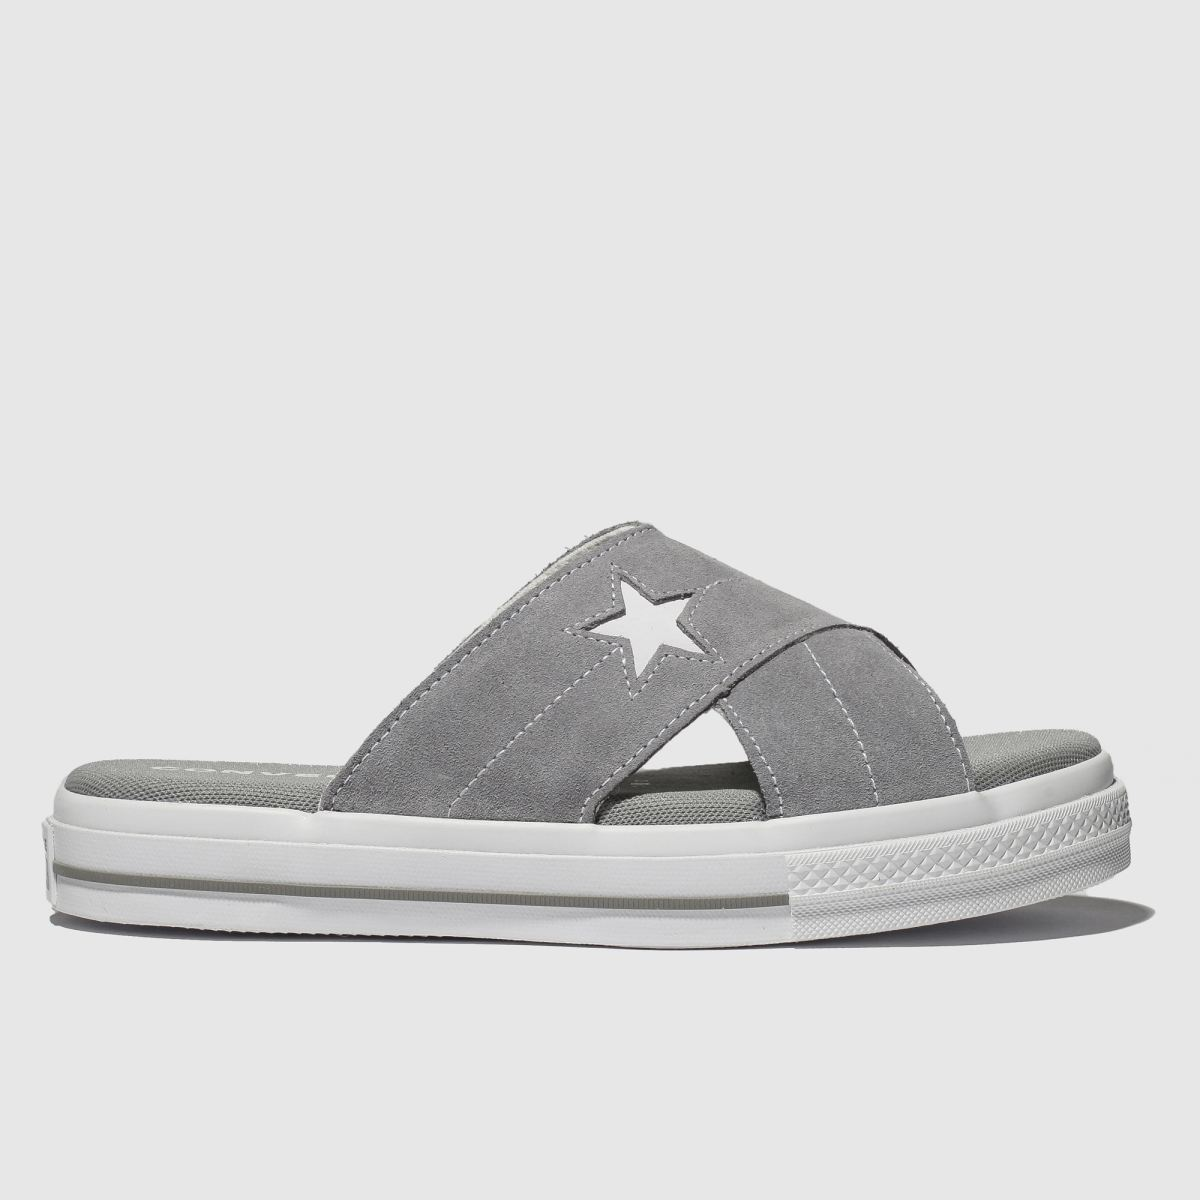 Converse Light Grey One Star Sandal Sandals